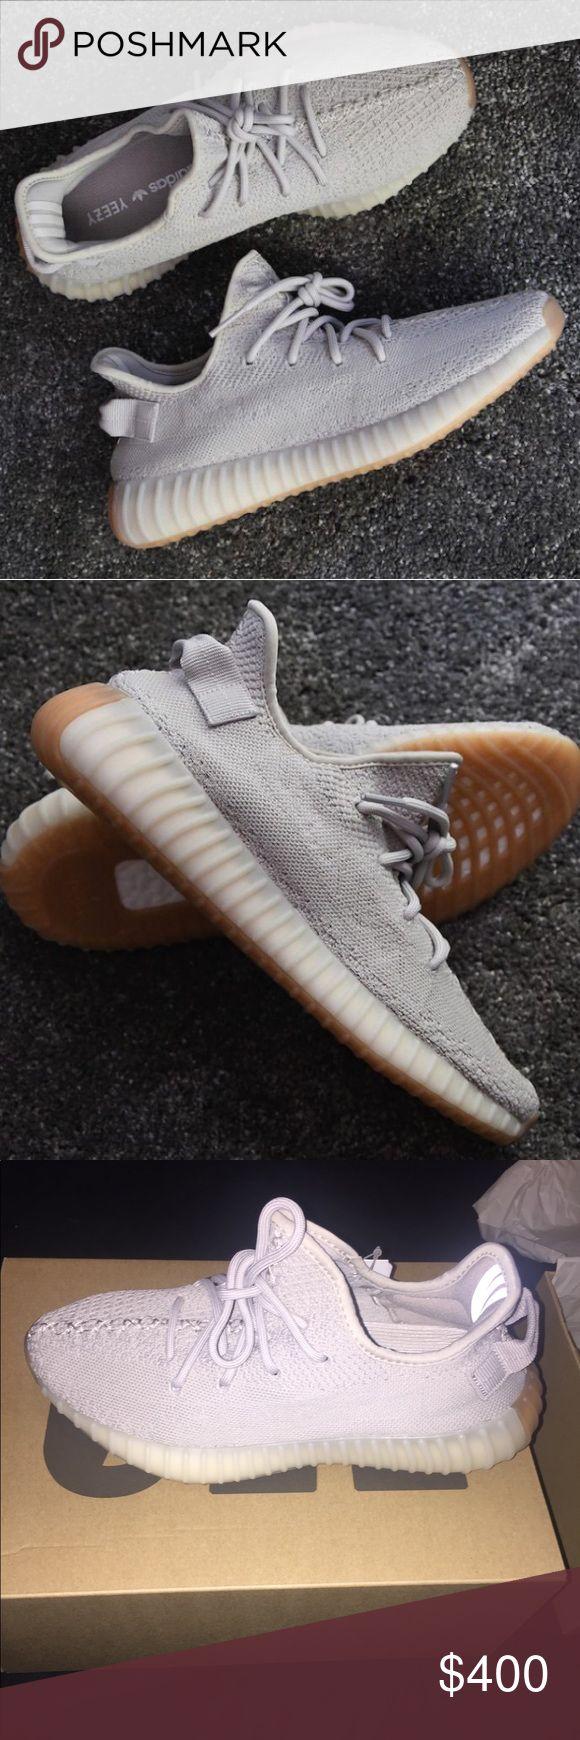 yeezy boost 350 v2 sesame  sneakers fashion fashion